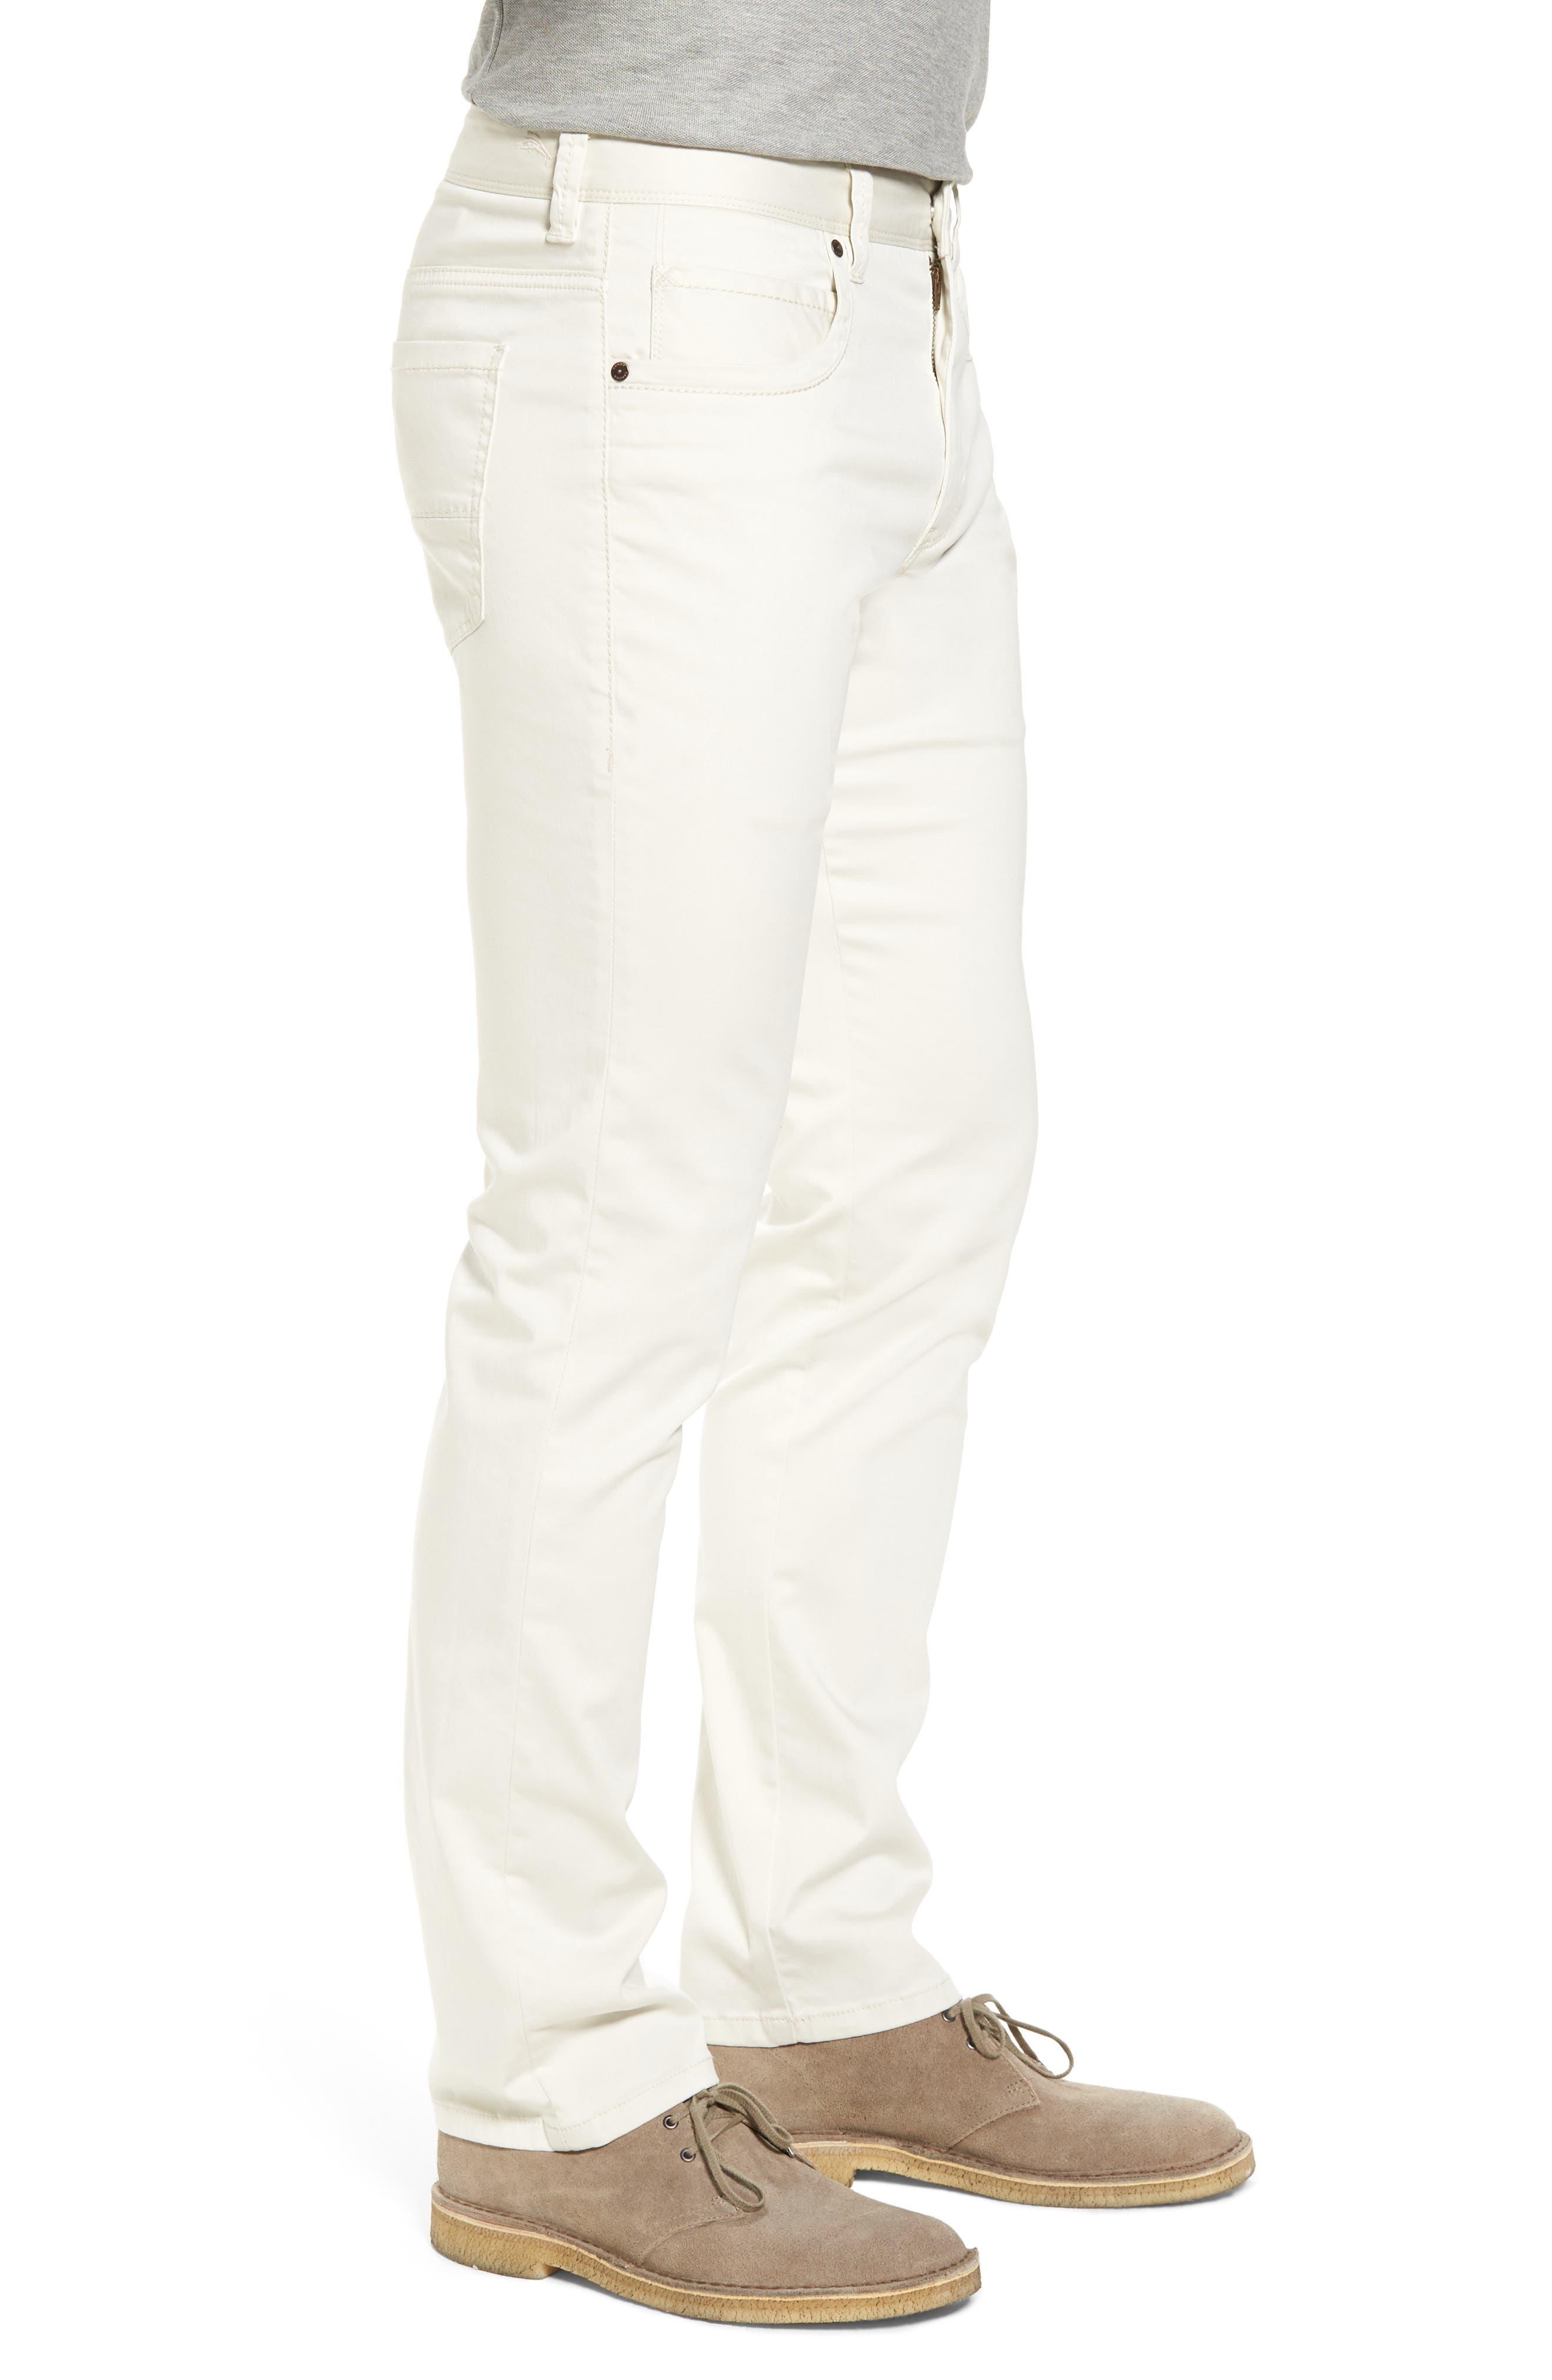 Boracay Pants,                             Alternate thumbnail 8, color,